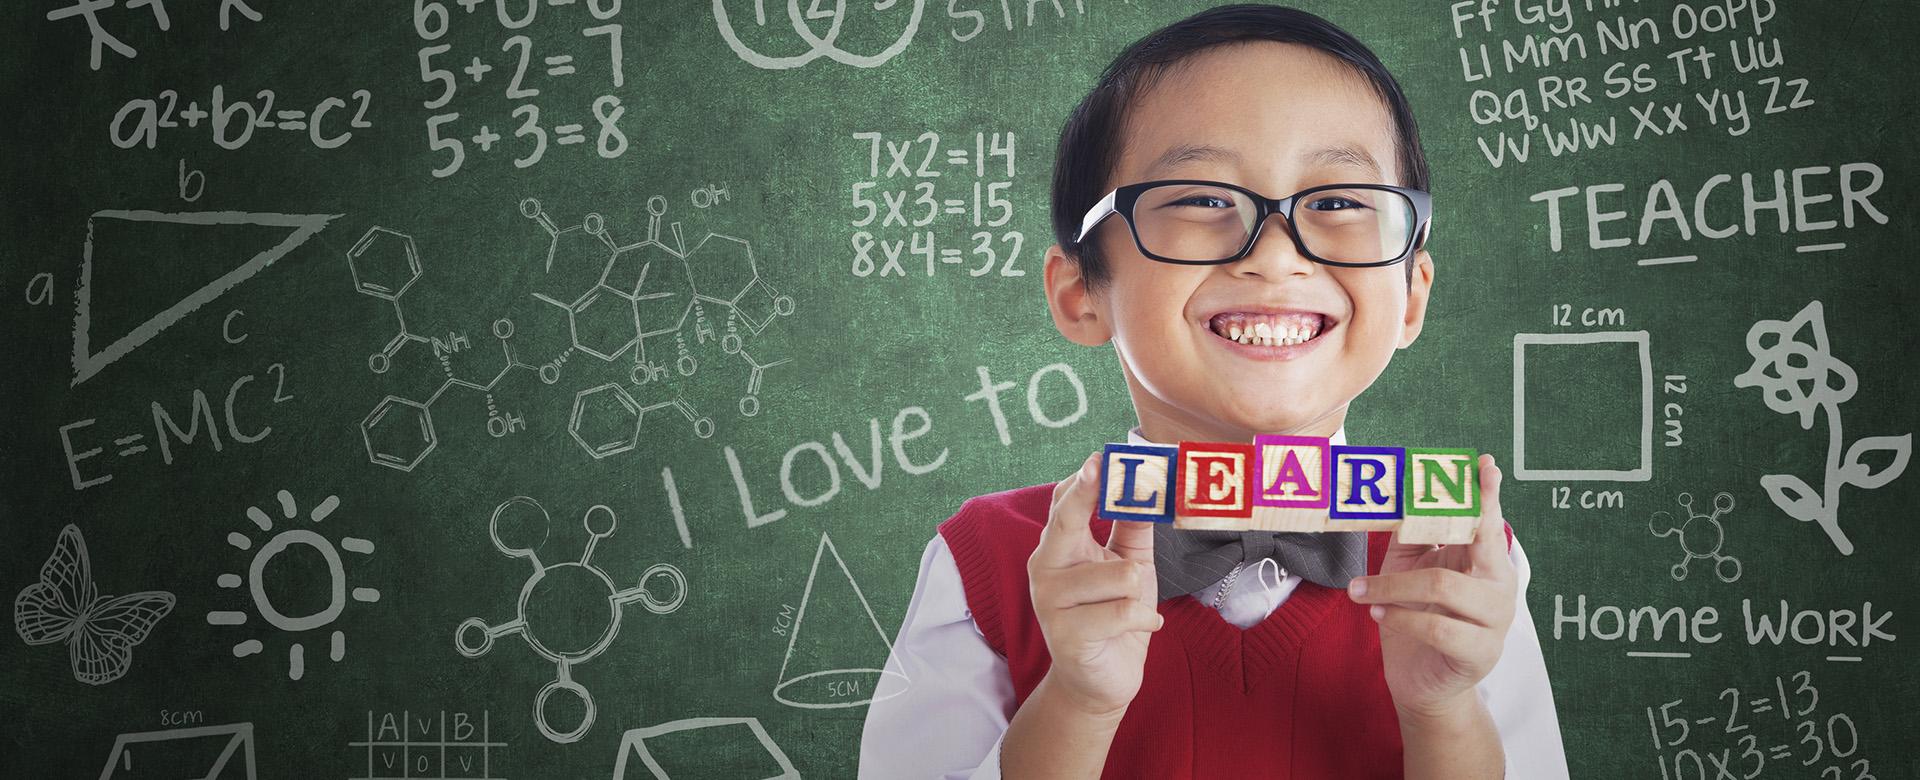 Portrait of asian elementary school student showing LEARN word in class